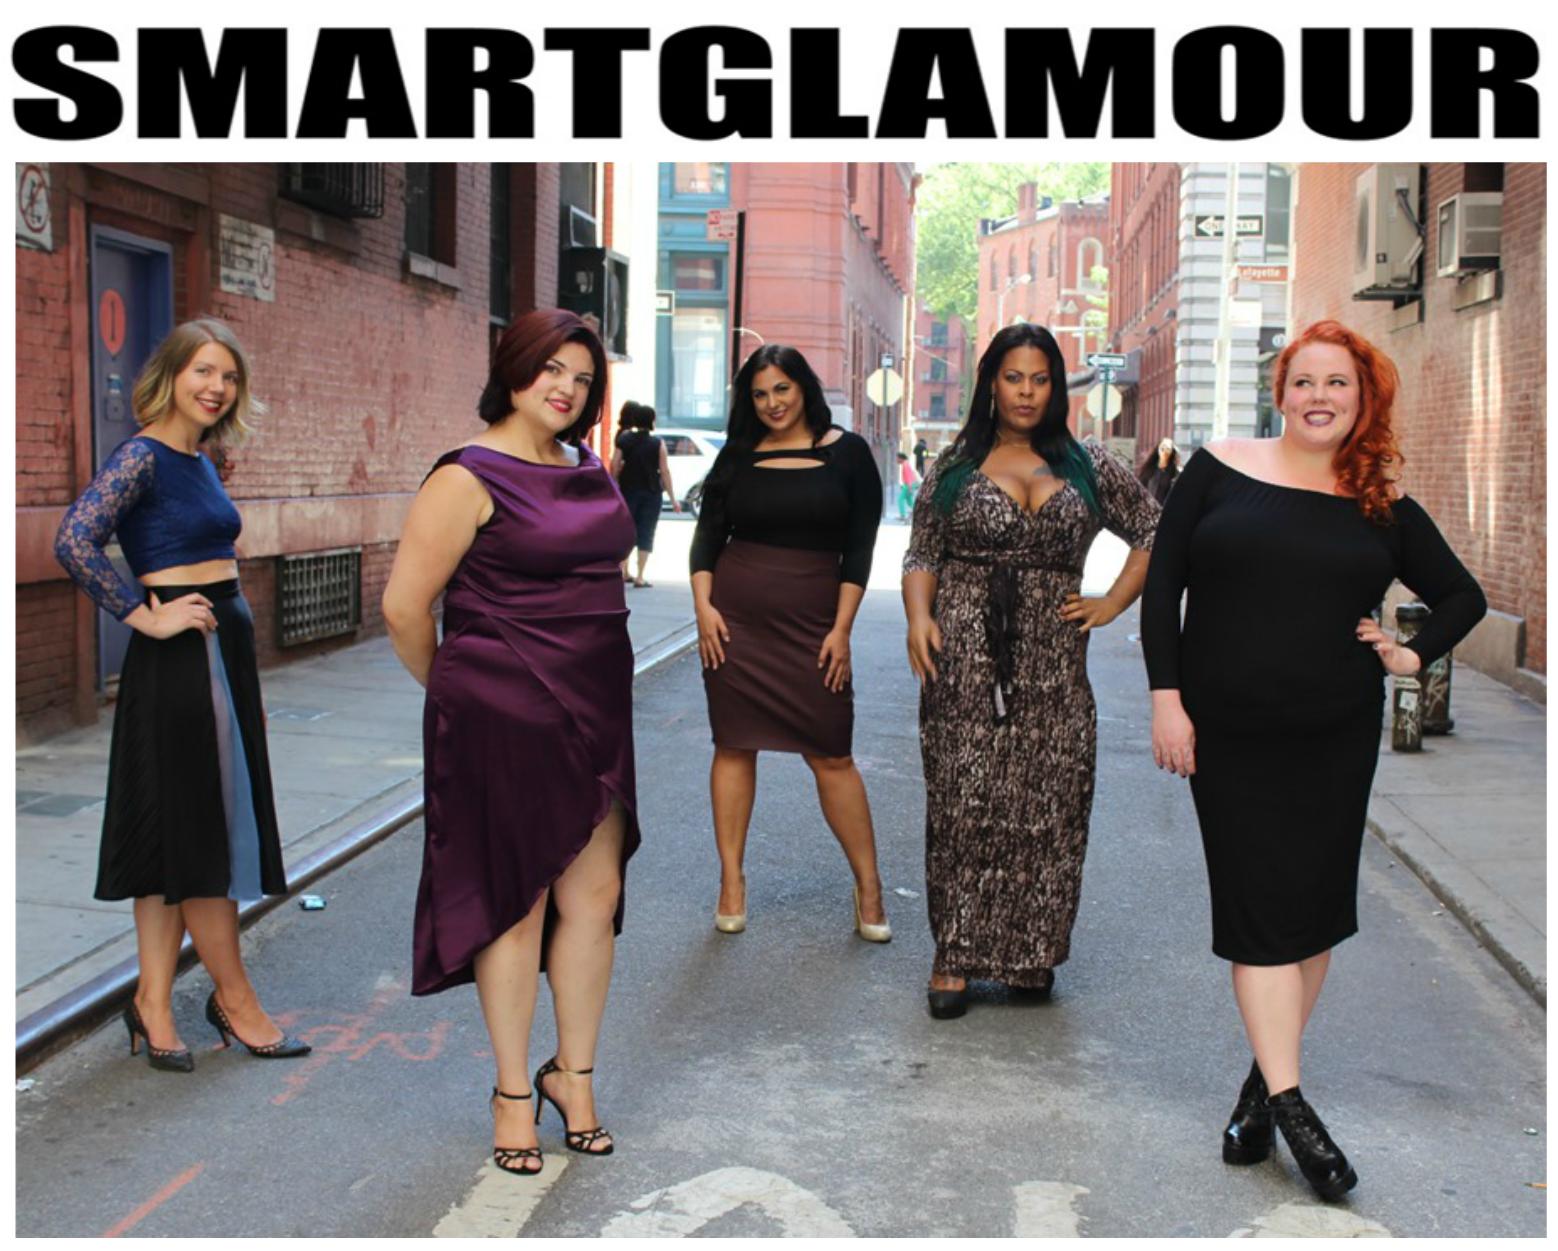 SmartGlamour: Stylish Fashion for ALL Women